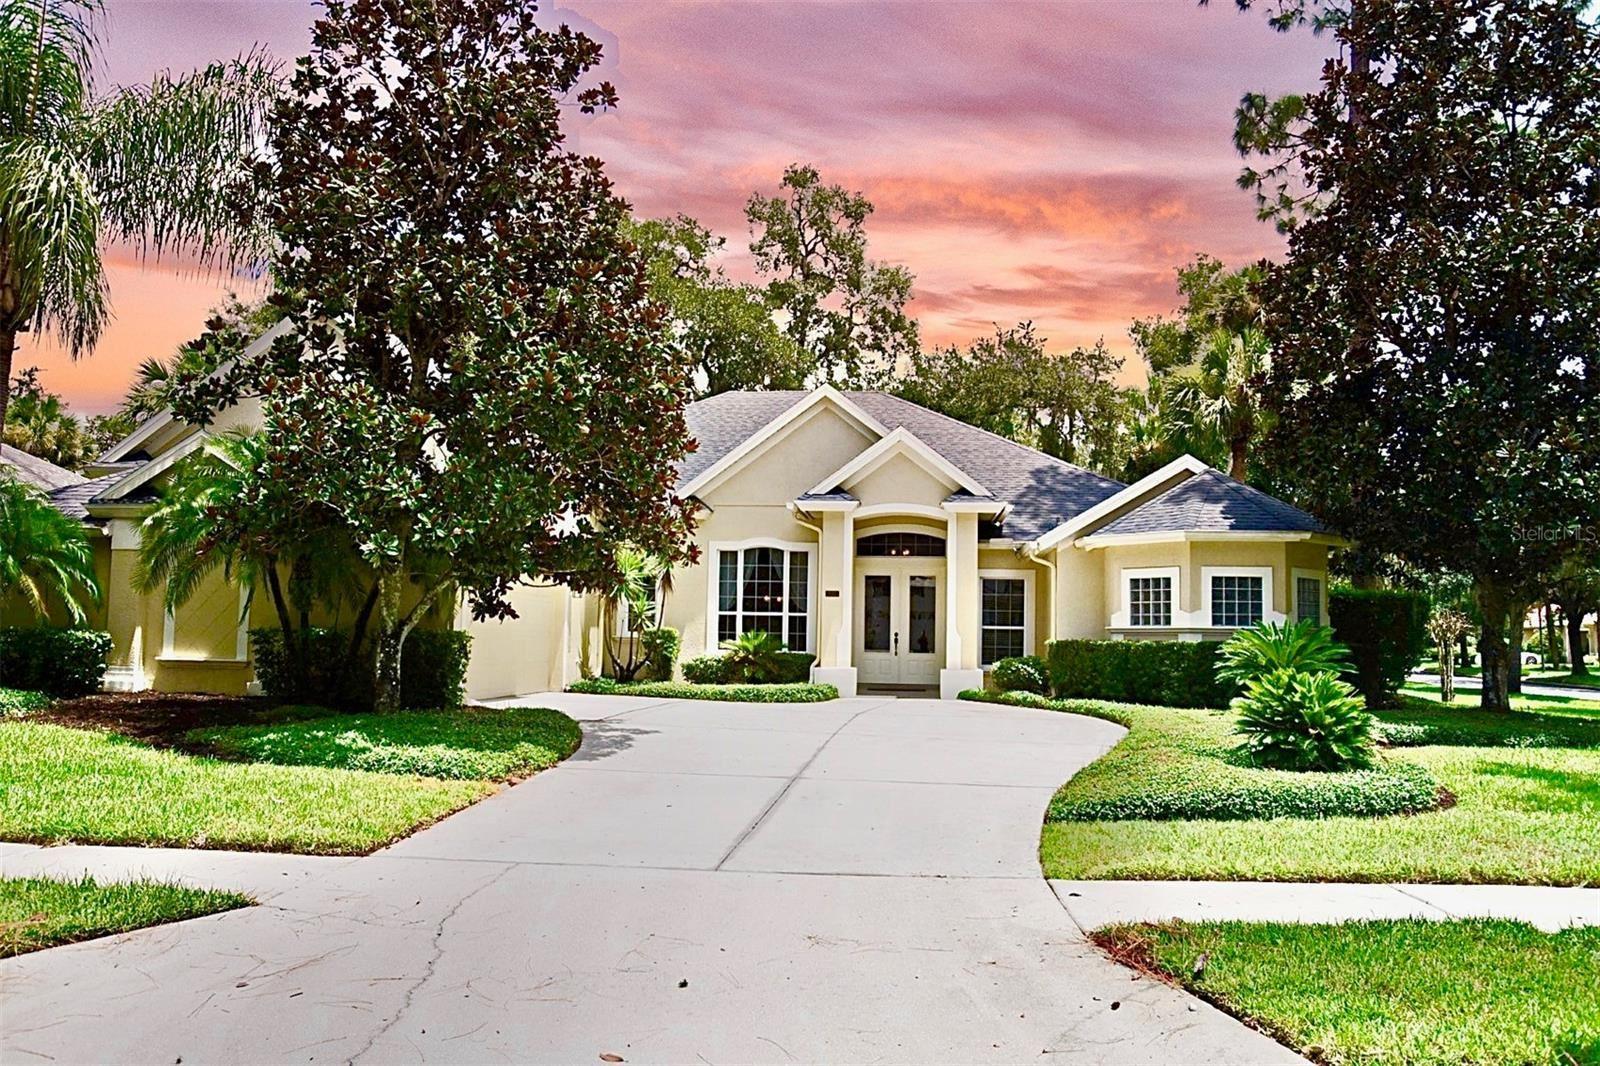 837 EDGEFOREST TERRACE, Sanford, FL 32771 - #: O5963399